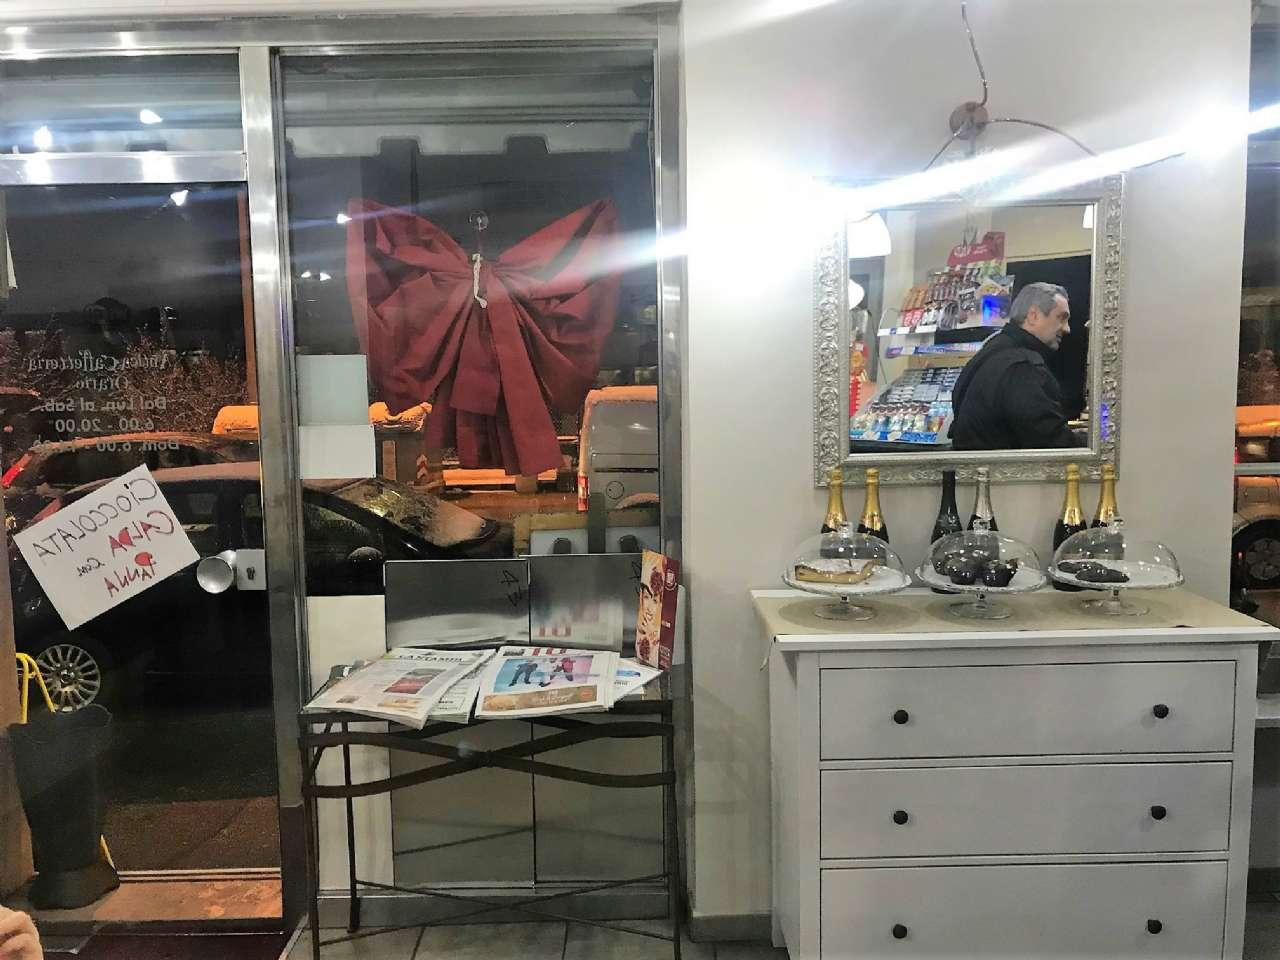 Nichelino Vendita BAR Immagine 1